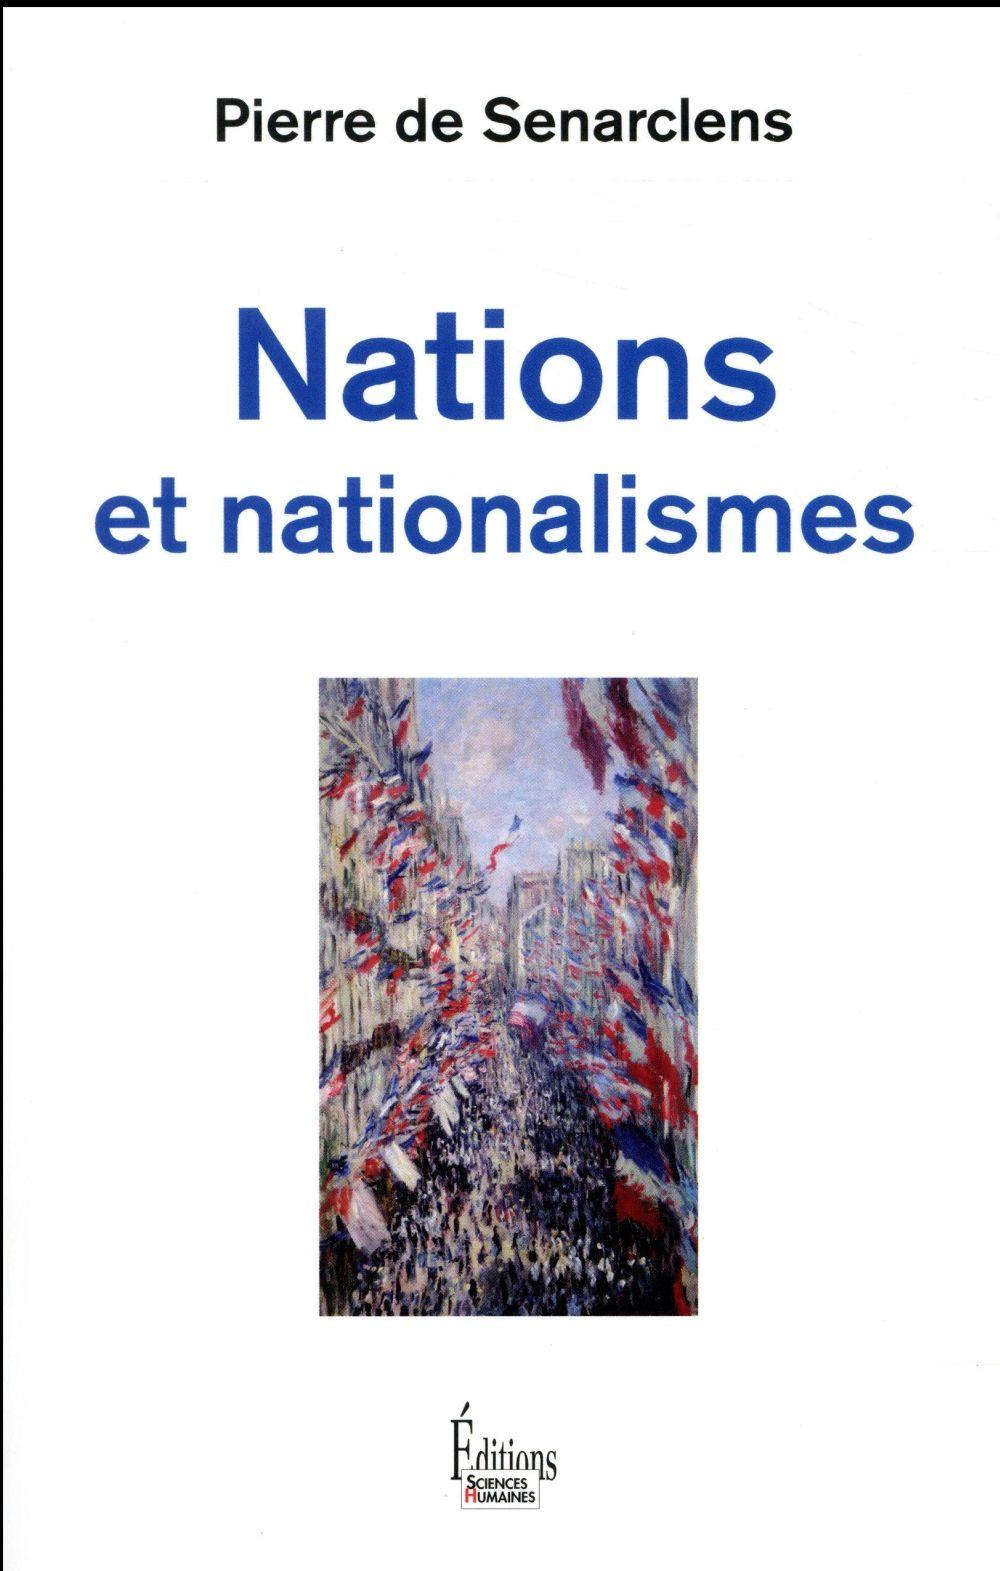 NATIONS ET NATIONALISMES